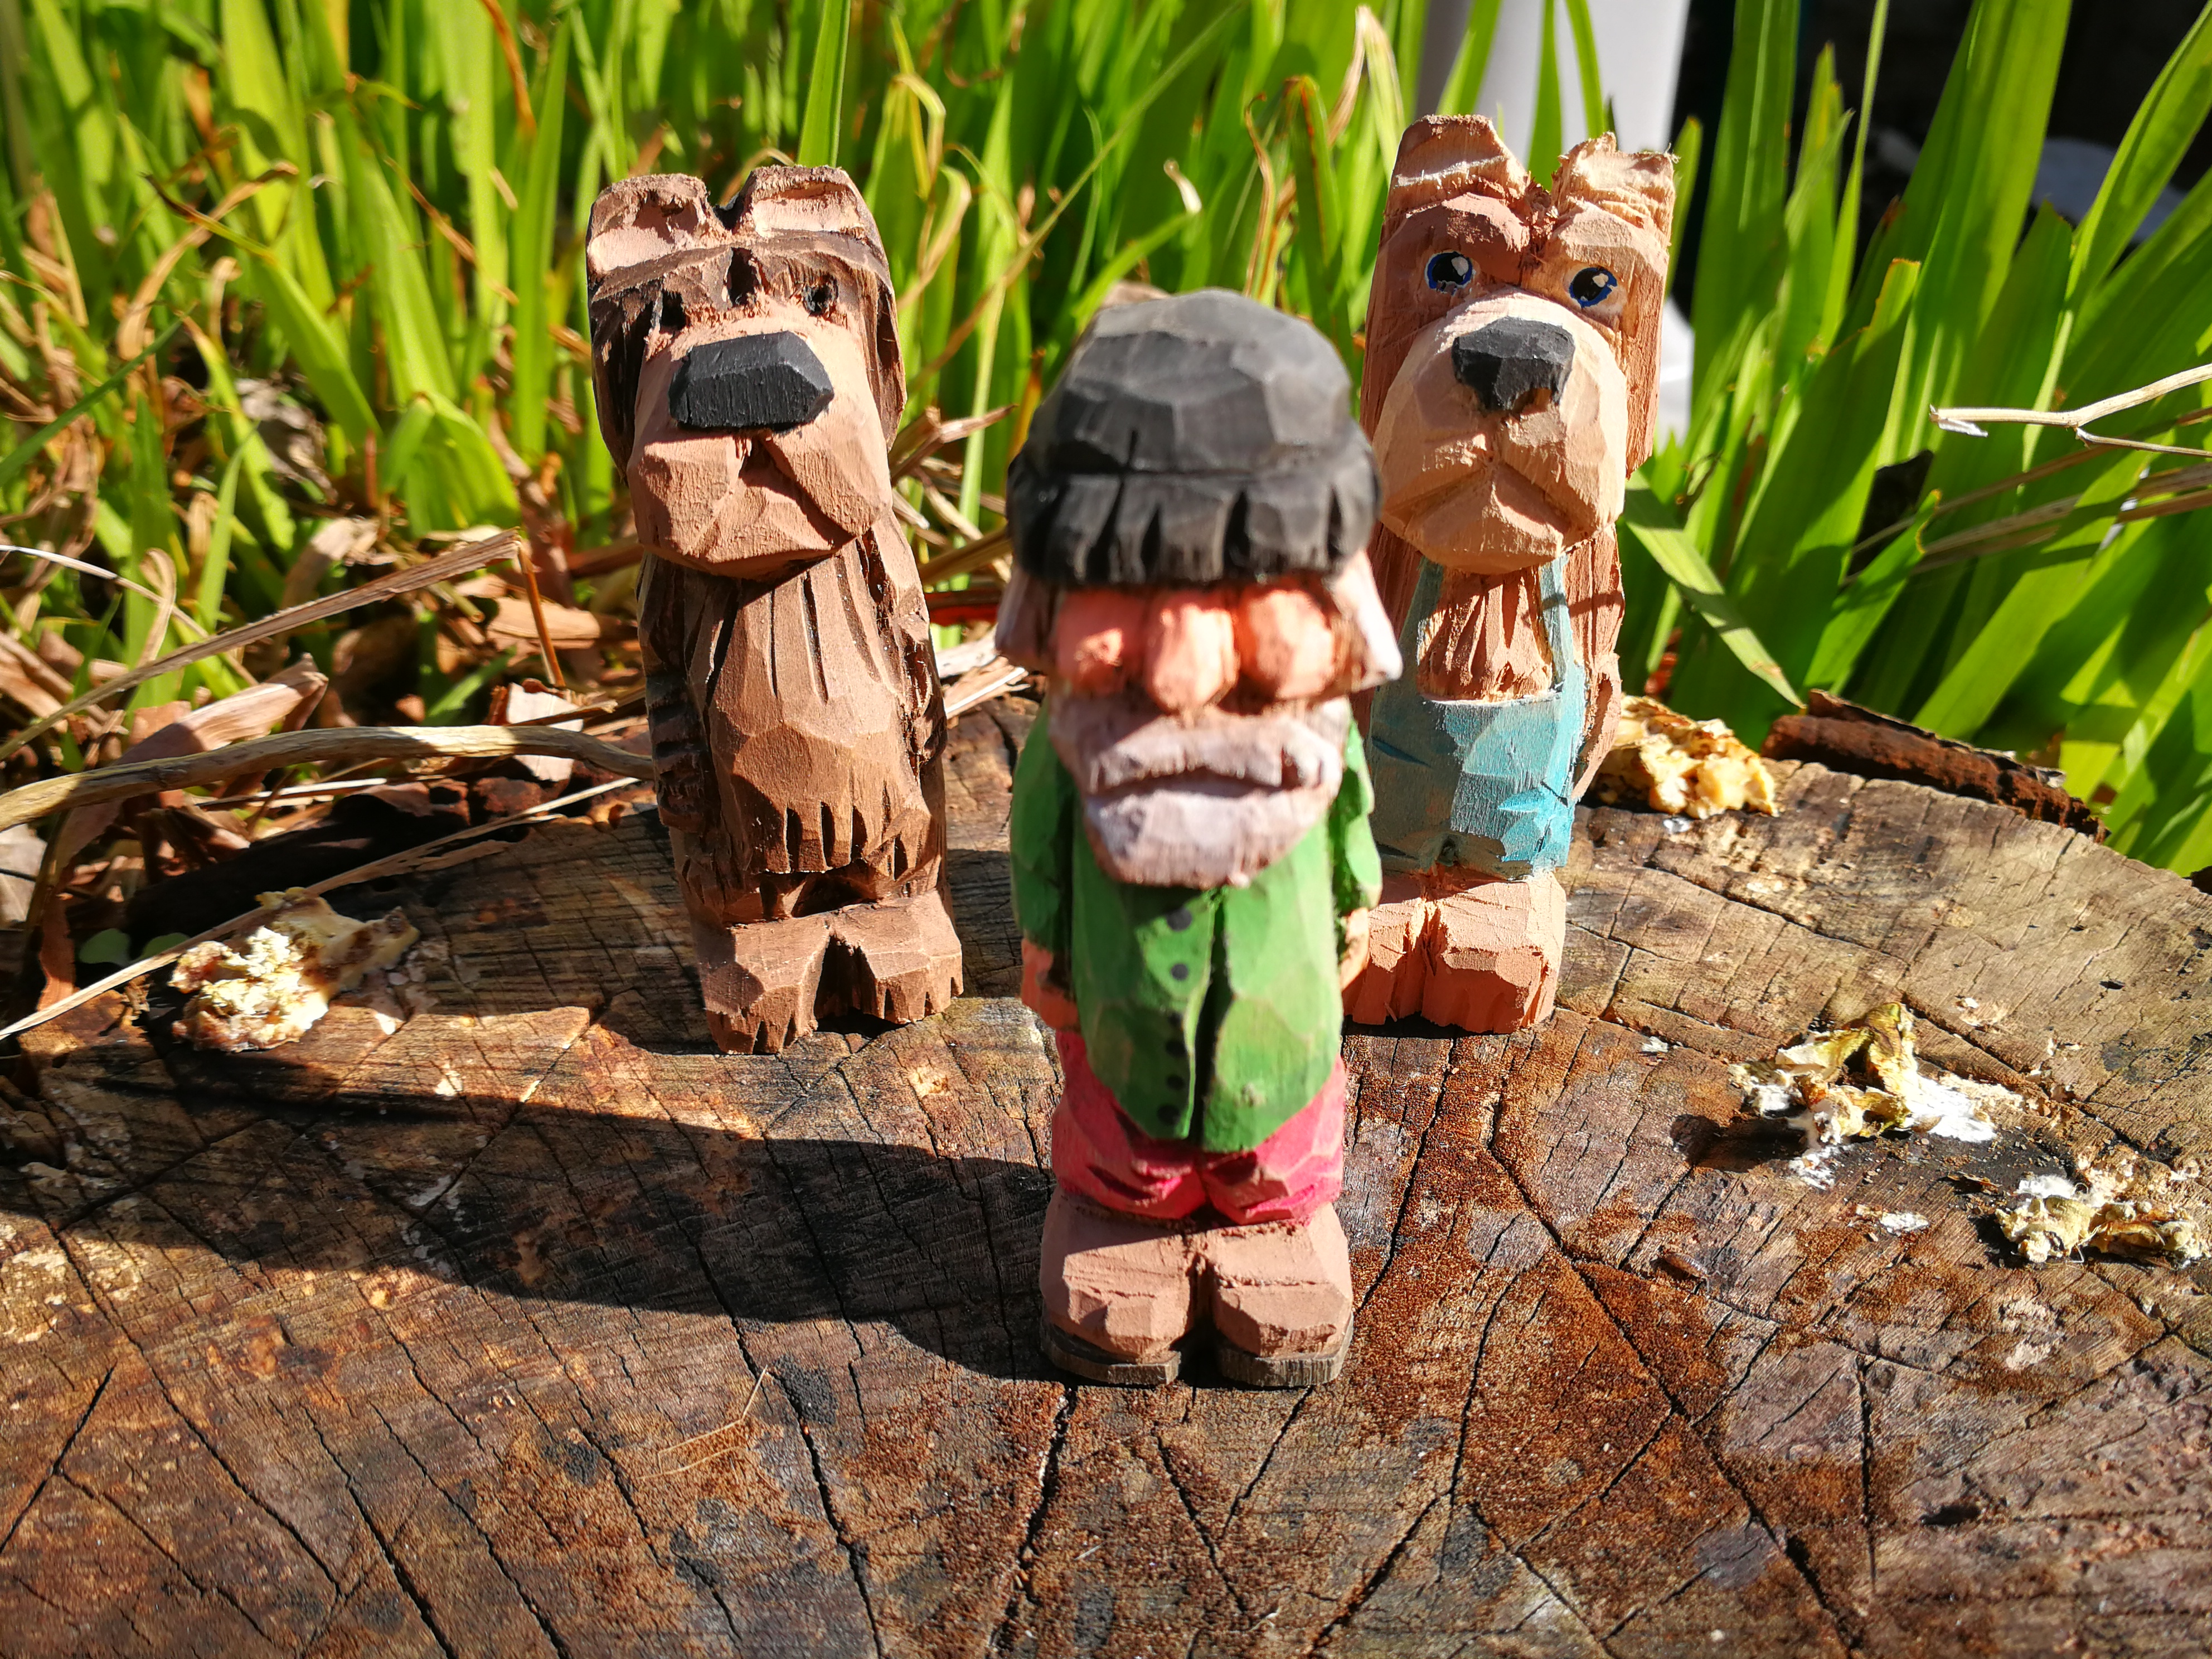 Wood carving tools and Bushcraft - Flexcut Tool Company